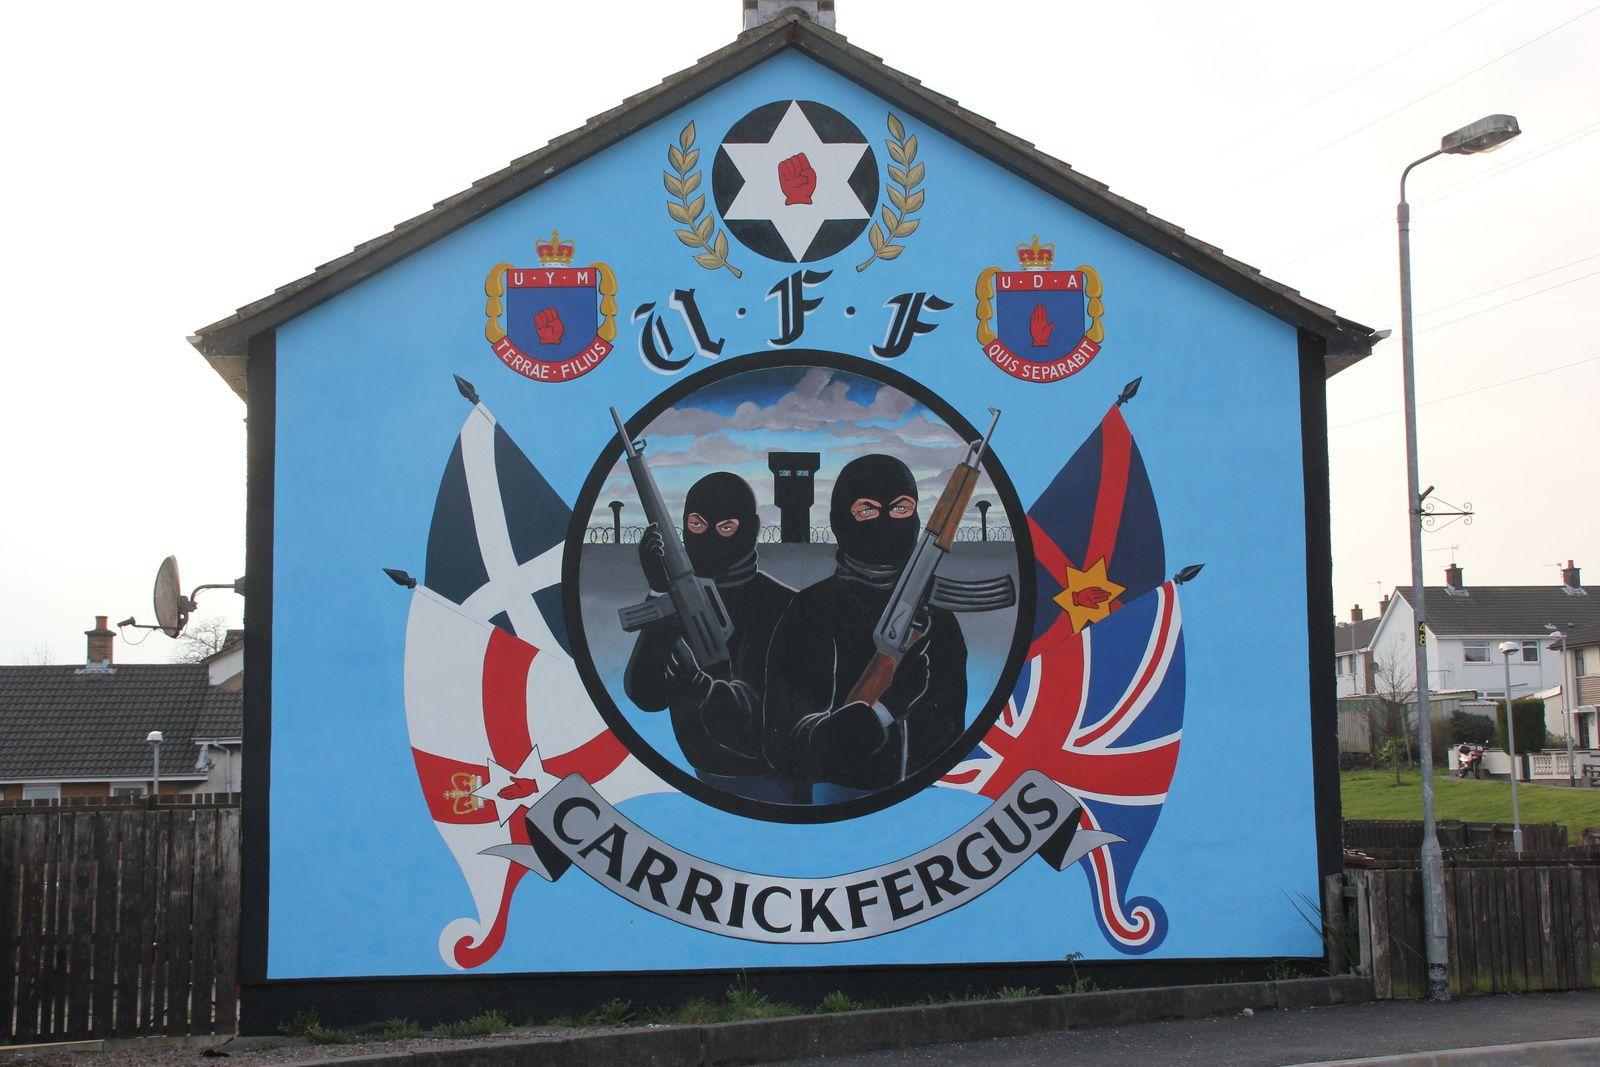 487) Castlemara Estate, Carrickfergus, Antrim